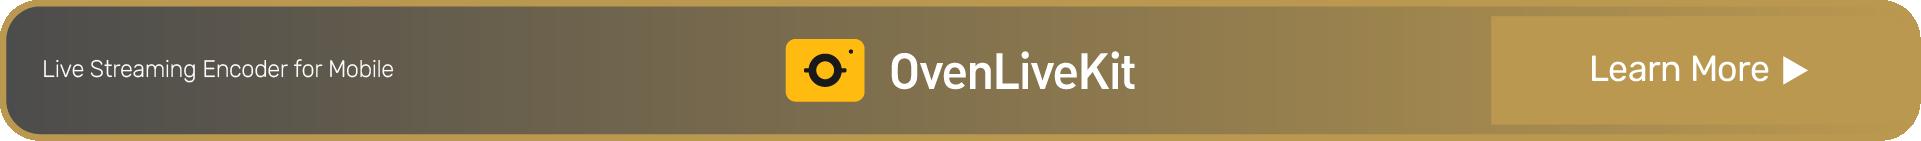 OvenLiveKit